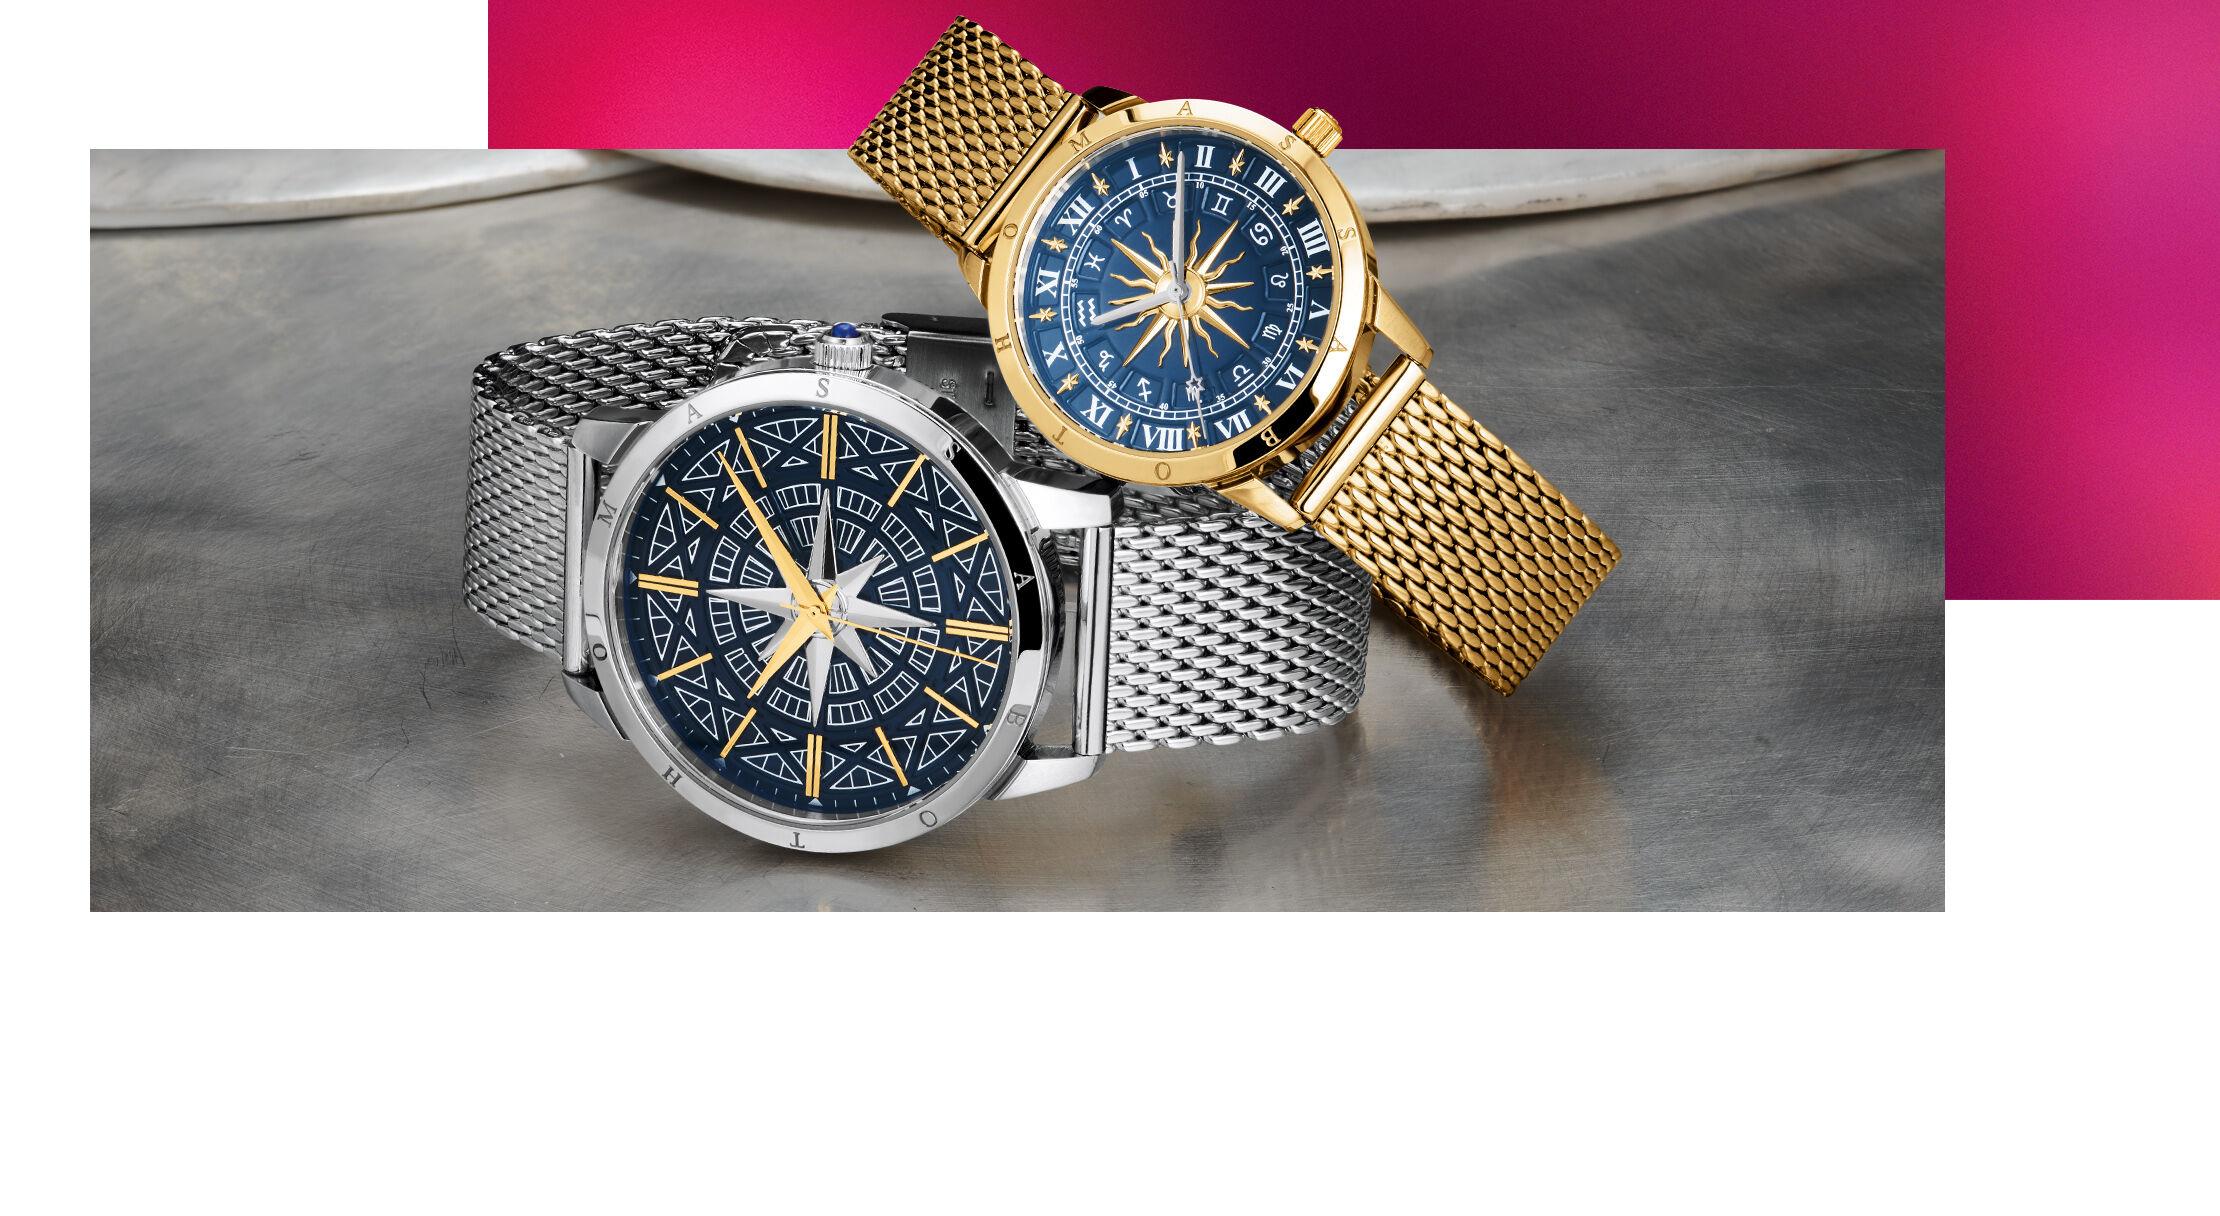 Jewellery, watches & fragrances - THOMAS SABO online shop